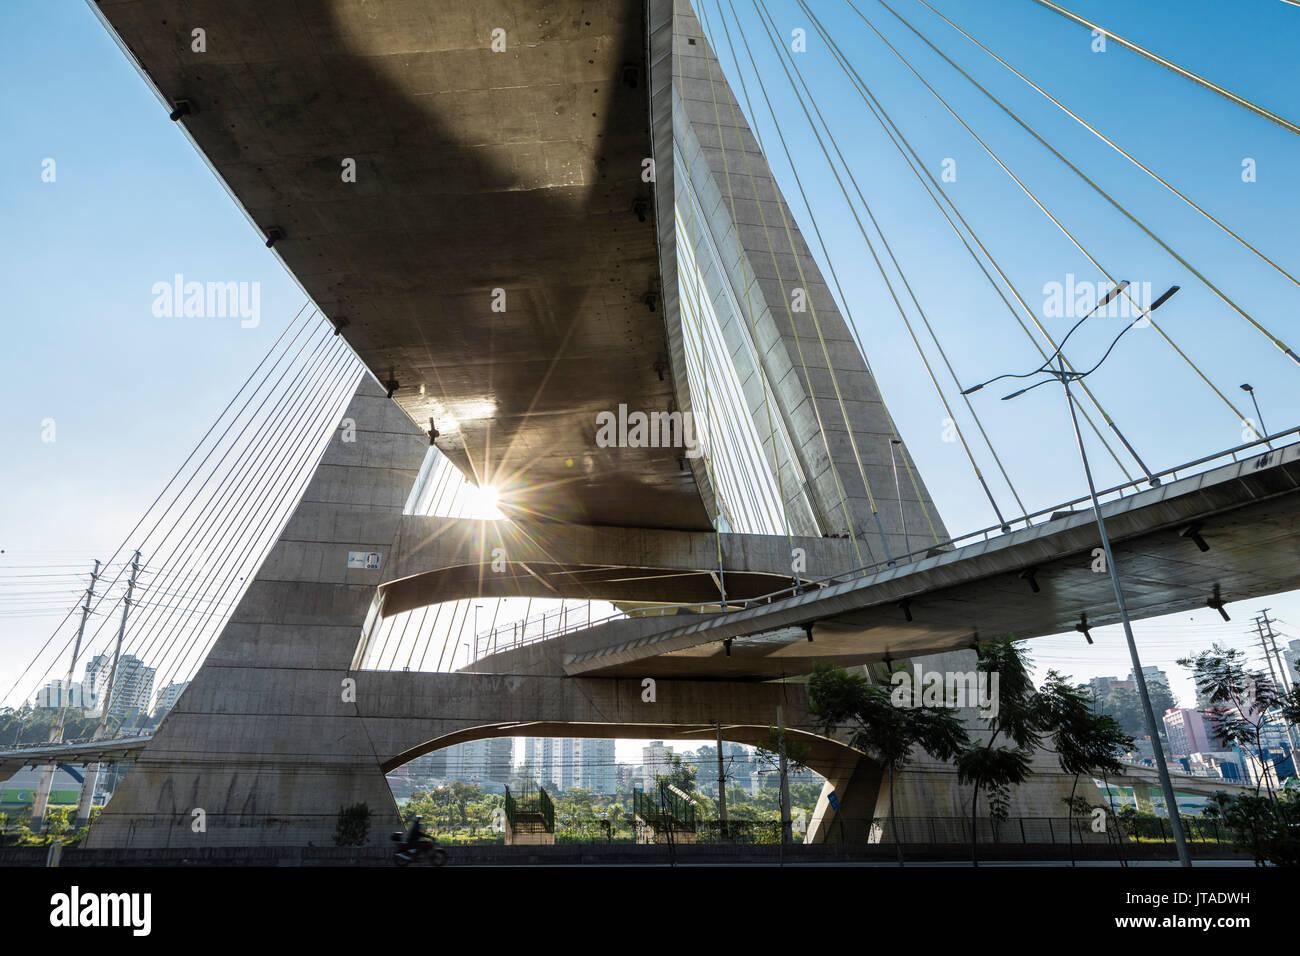 Octavio Frias de Oliveira Bridge da Joao Valente Filho nel quartiere Brooklin di Sao Paulo, Brasile, Sud America Immagini Stock